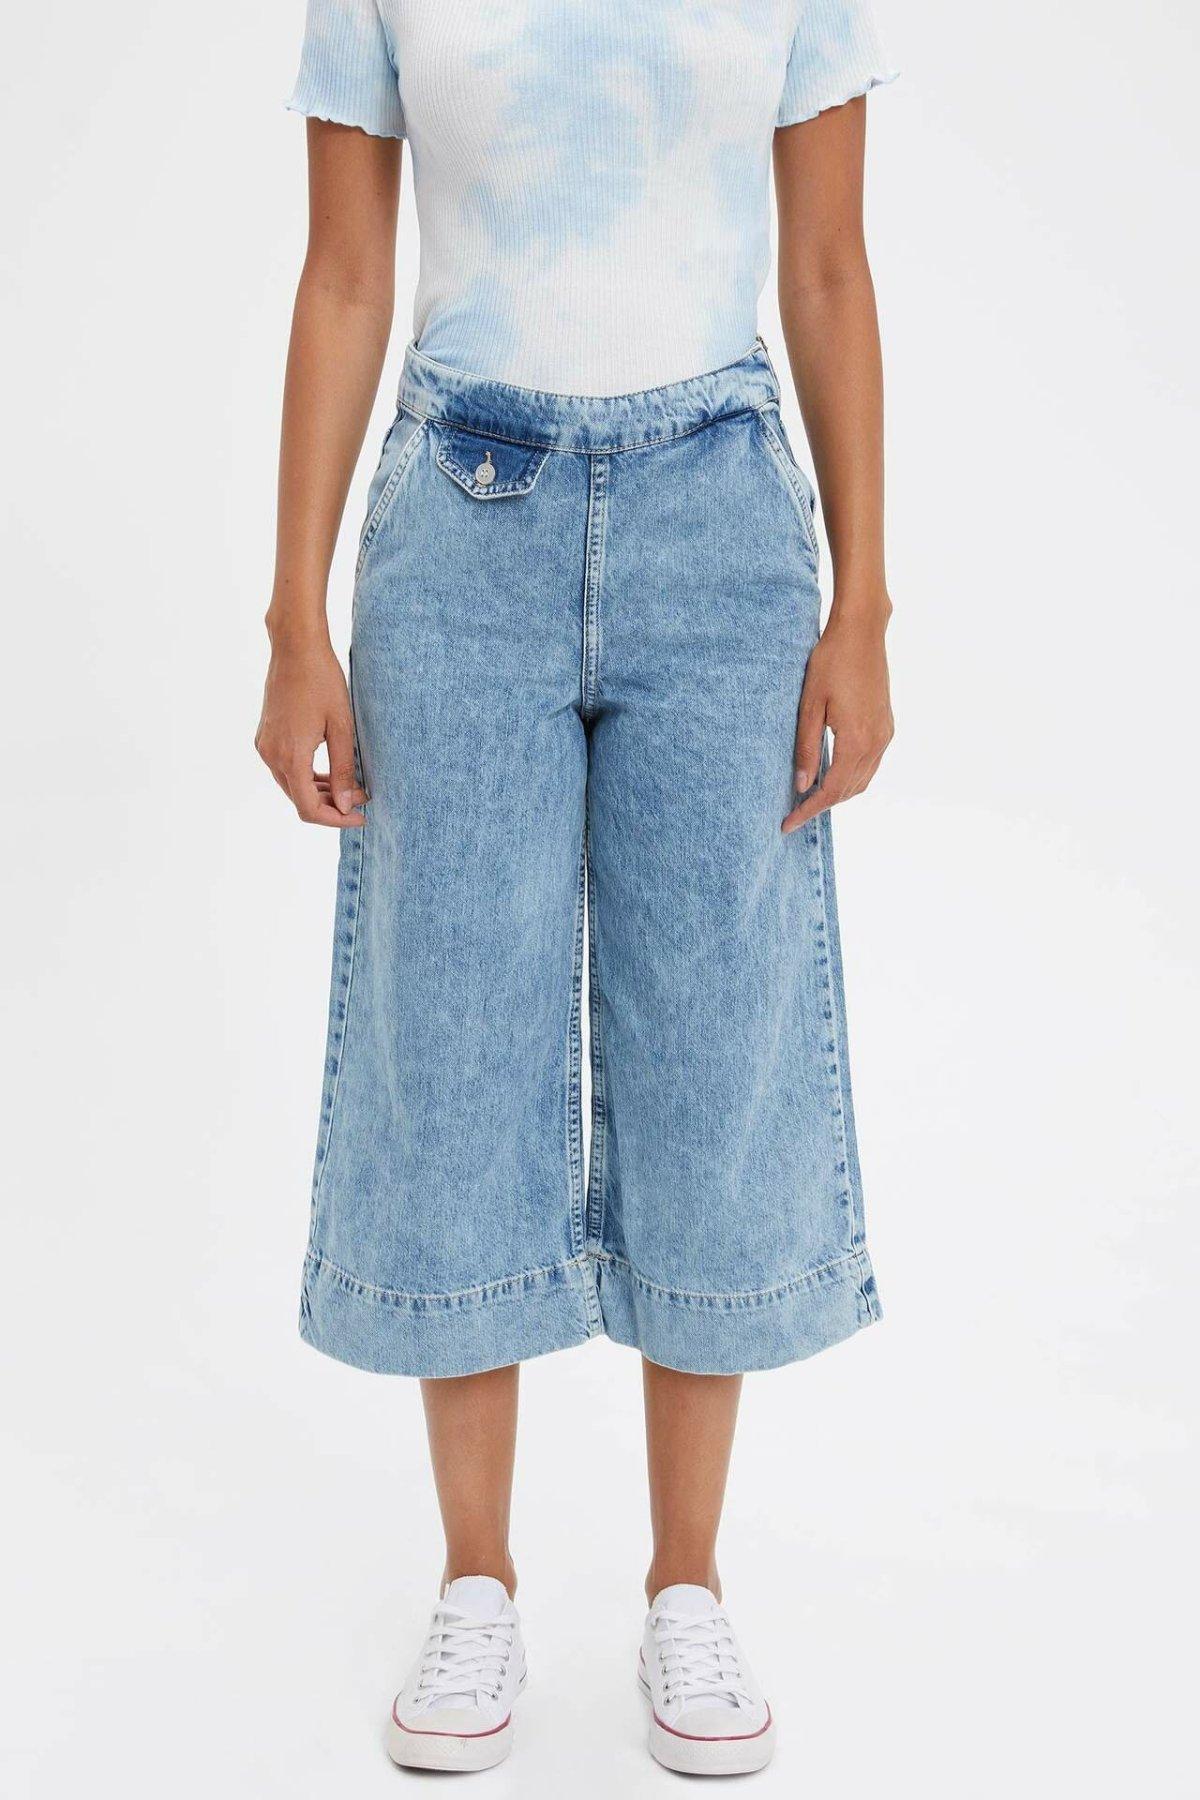 DeFacto Blue Denim Wide Leg Pants Women Fashion Jeans Stylish Fall Trouser Loose Blue Women  Jeans-L5023AZ19HS-L5023AZ19HS